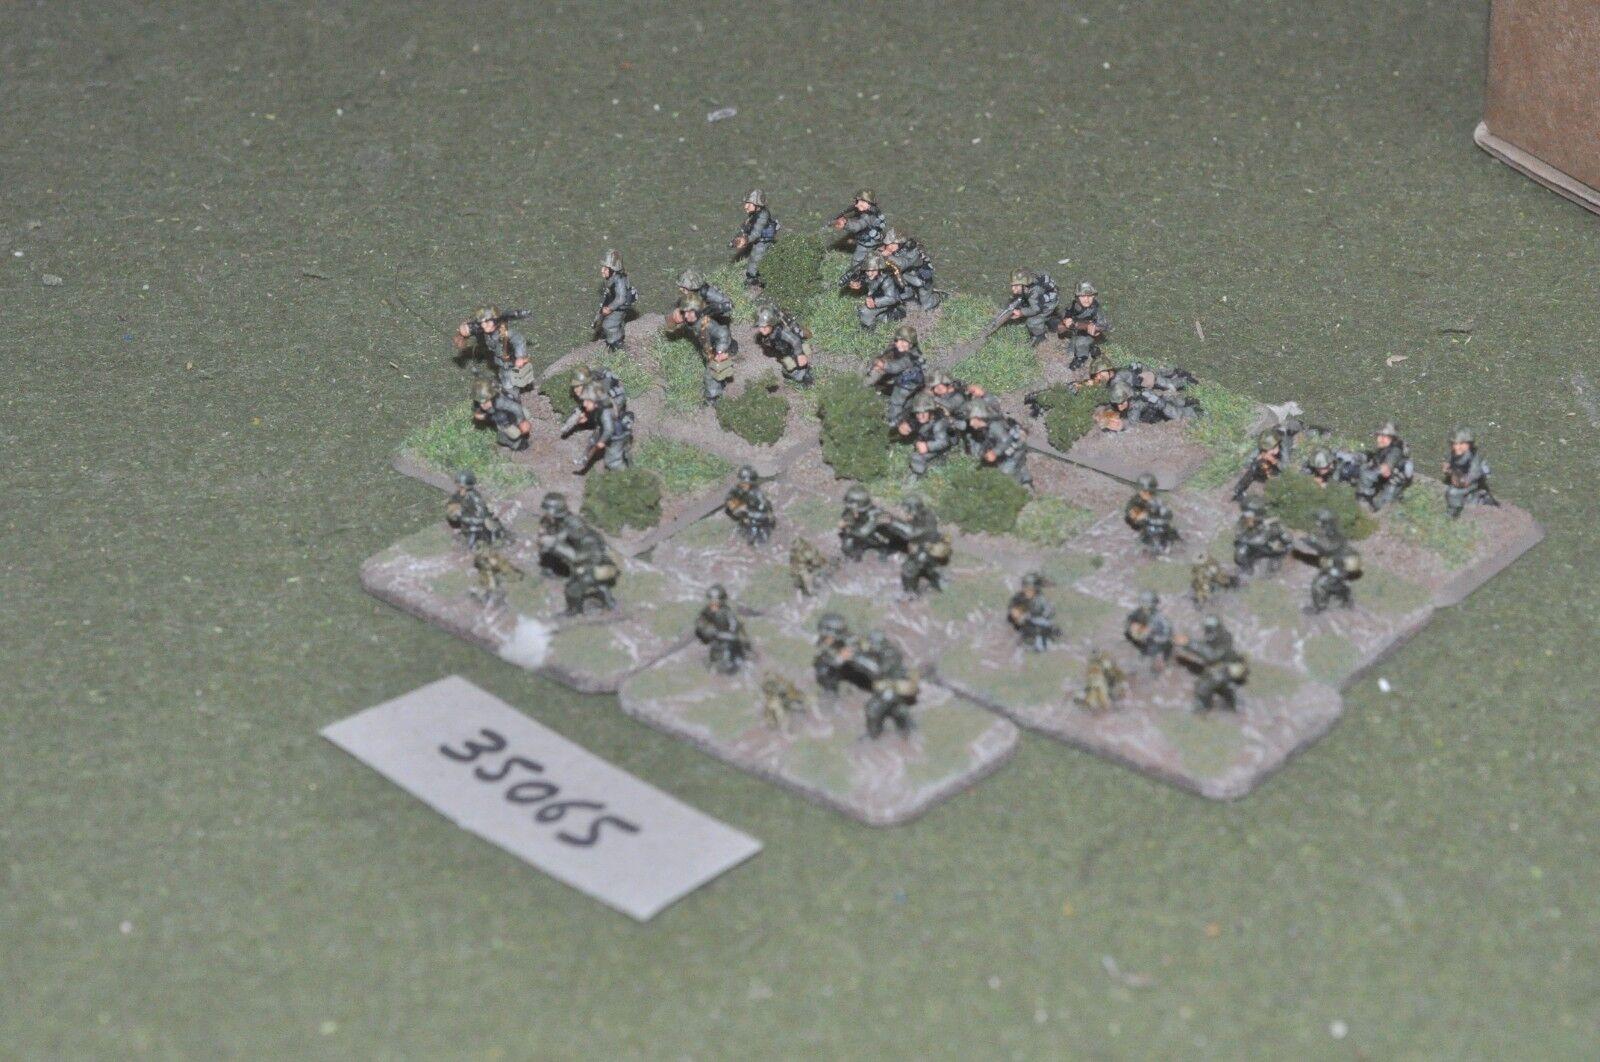 15 mm WW2 allemand-Battle Group 40 40 40 figures-INF (35065) bd9729